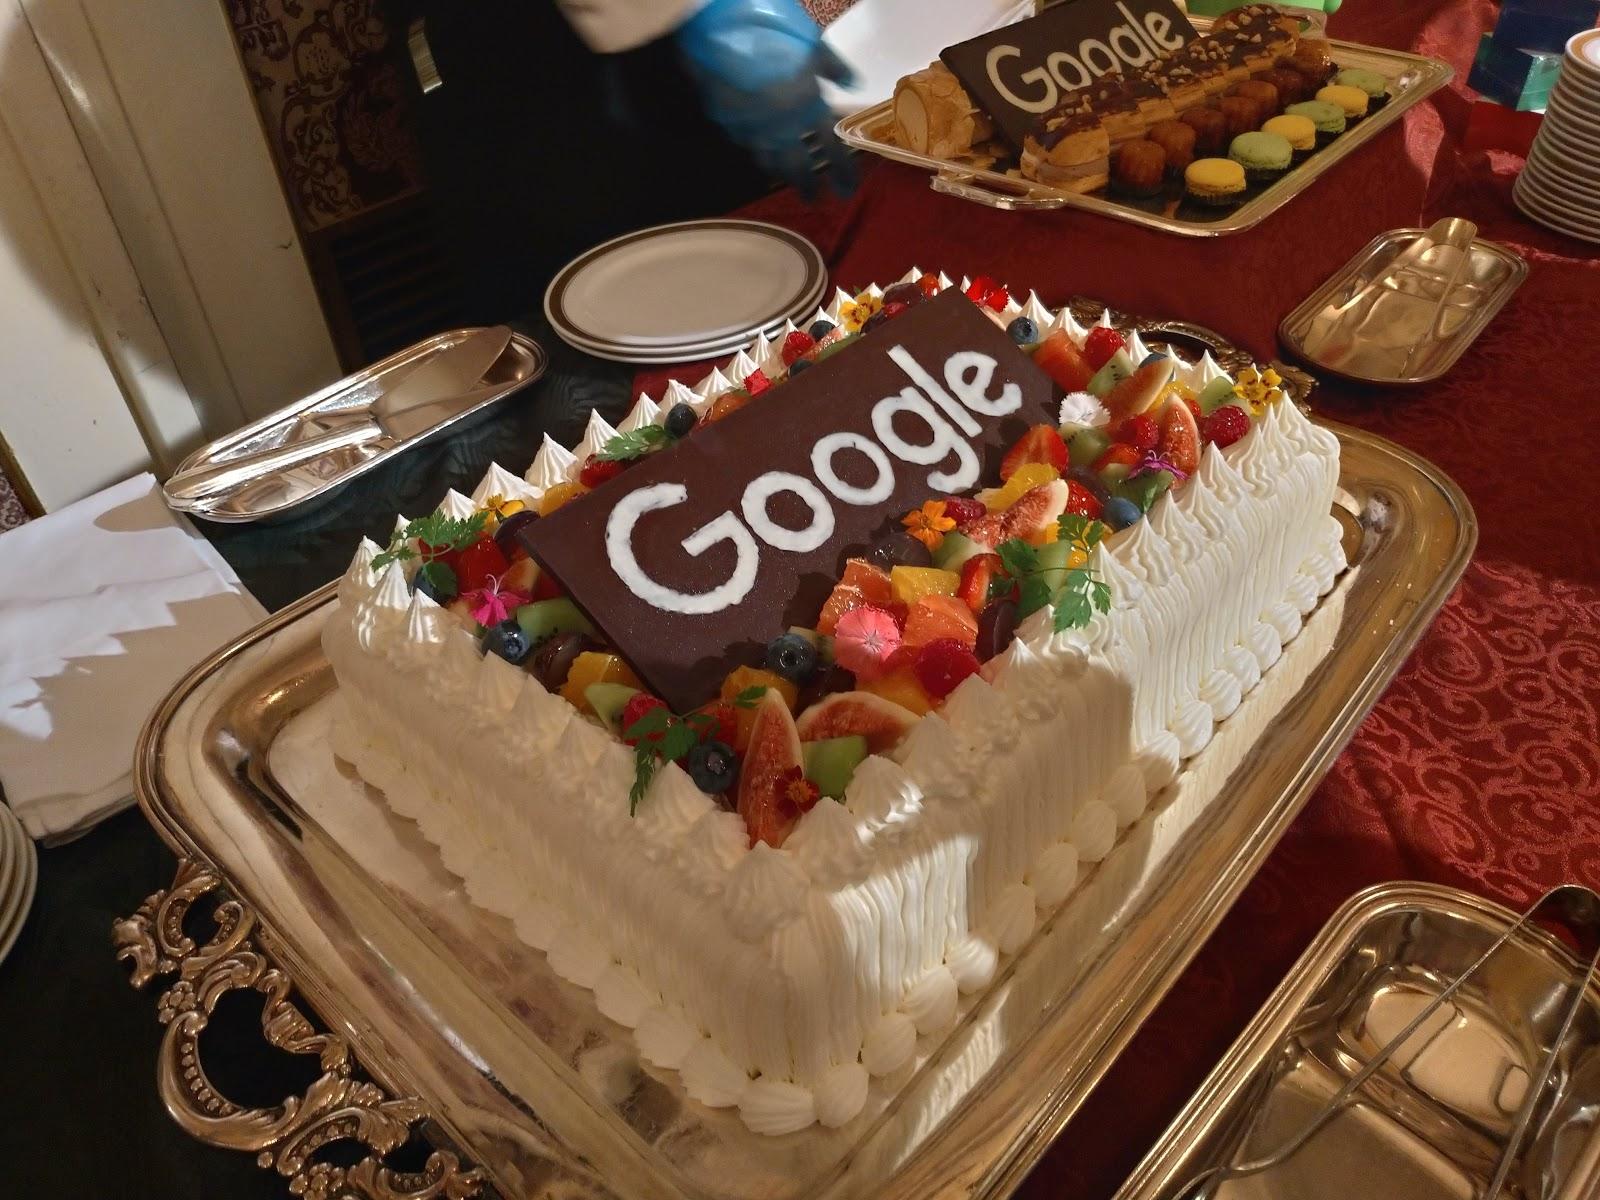 2019/07/04 Googleデジタルワークショップin福岡